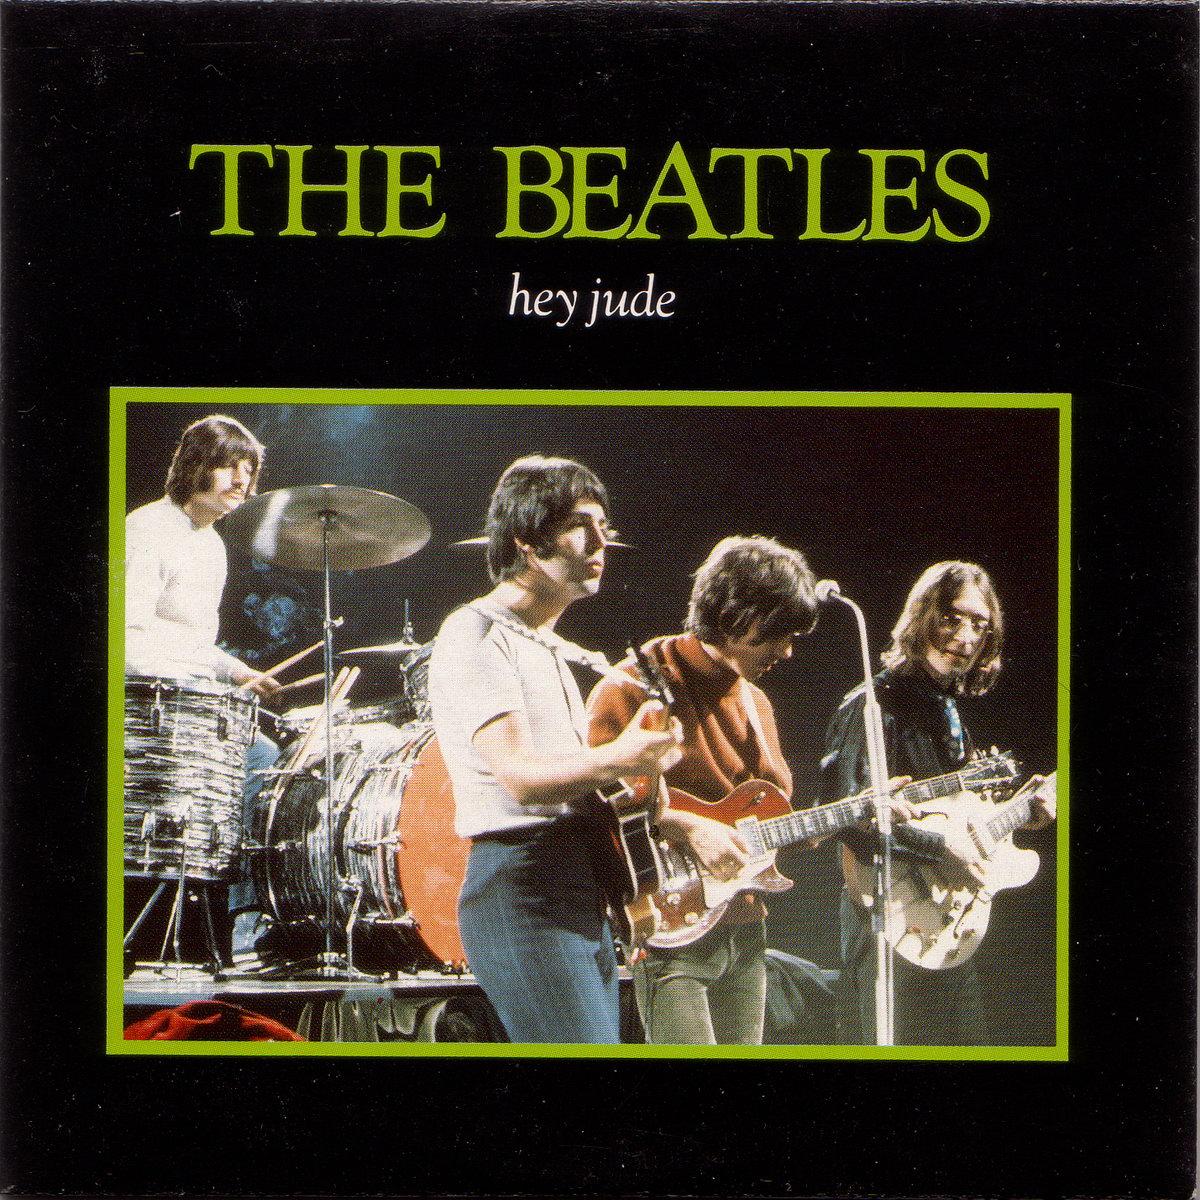 THE BEATLES - HEY JUDE ALBUM LYRICS